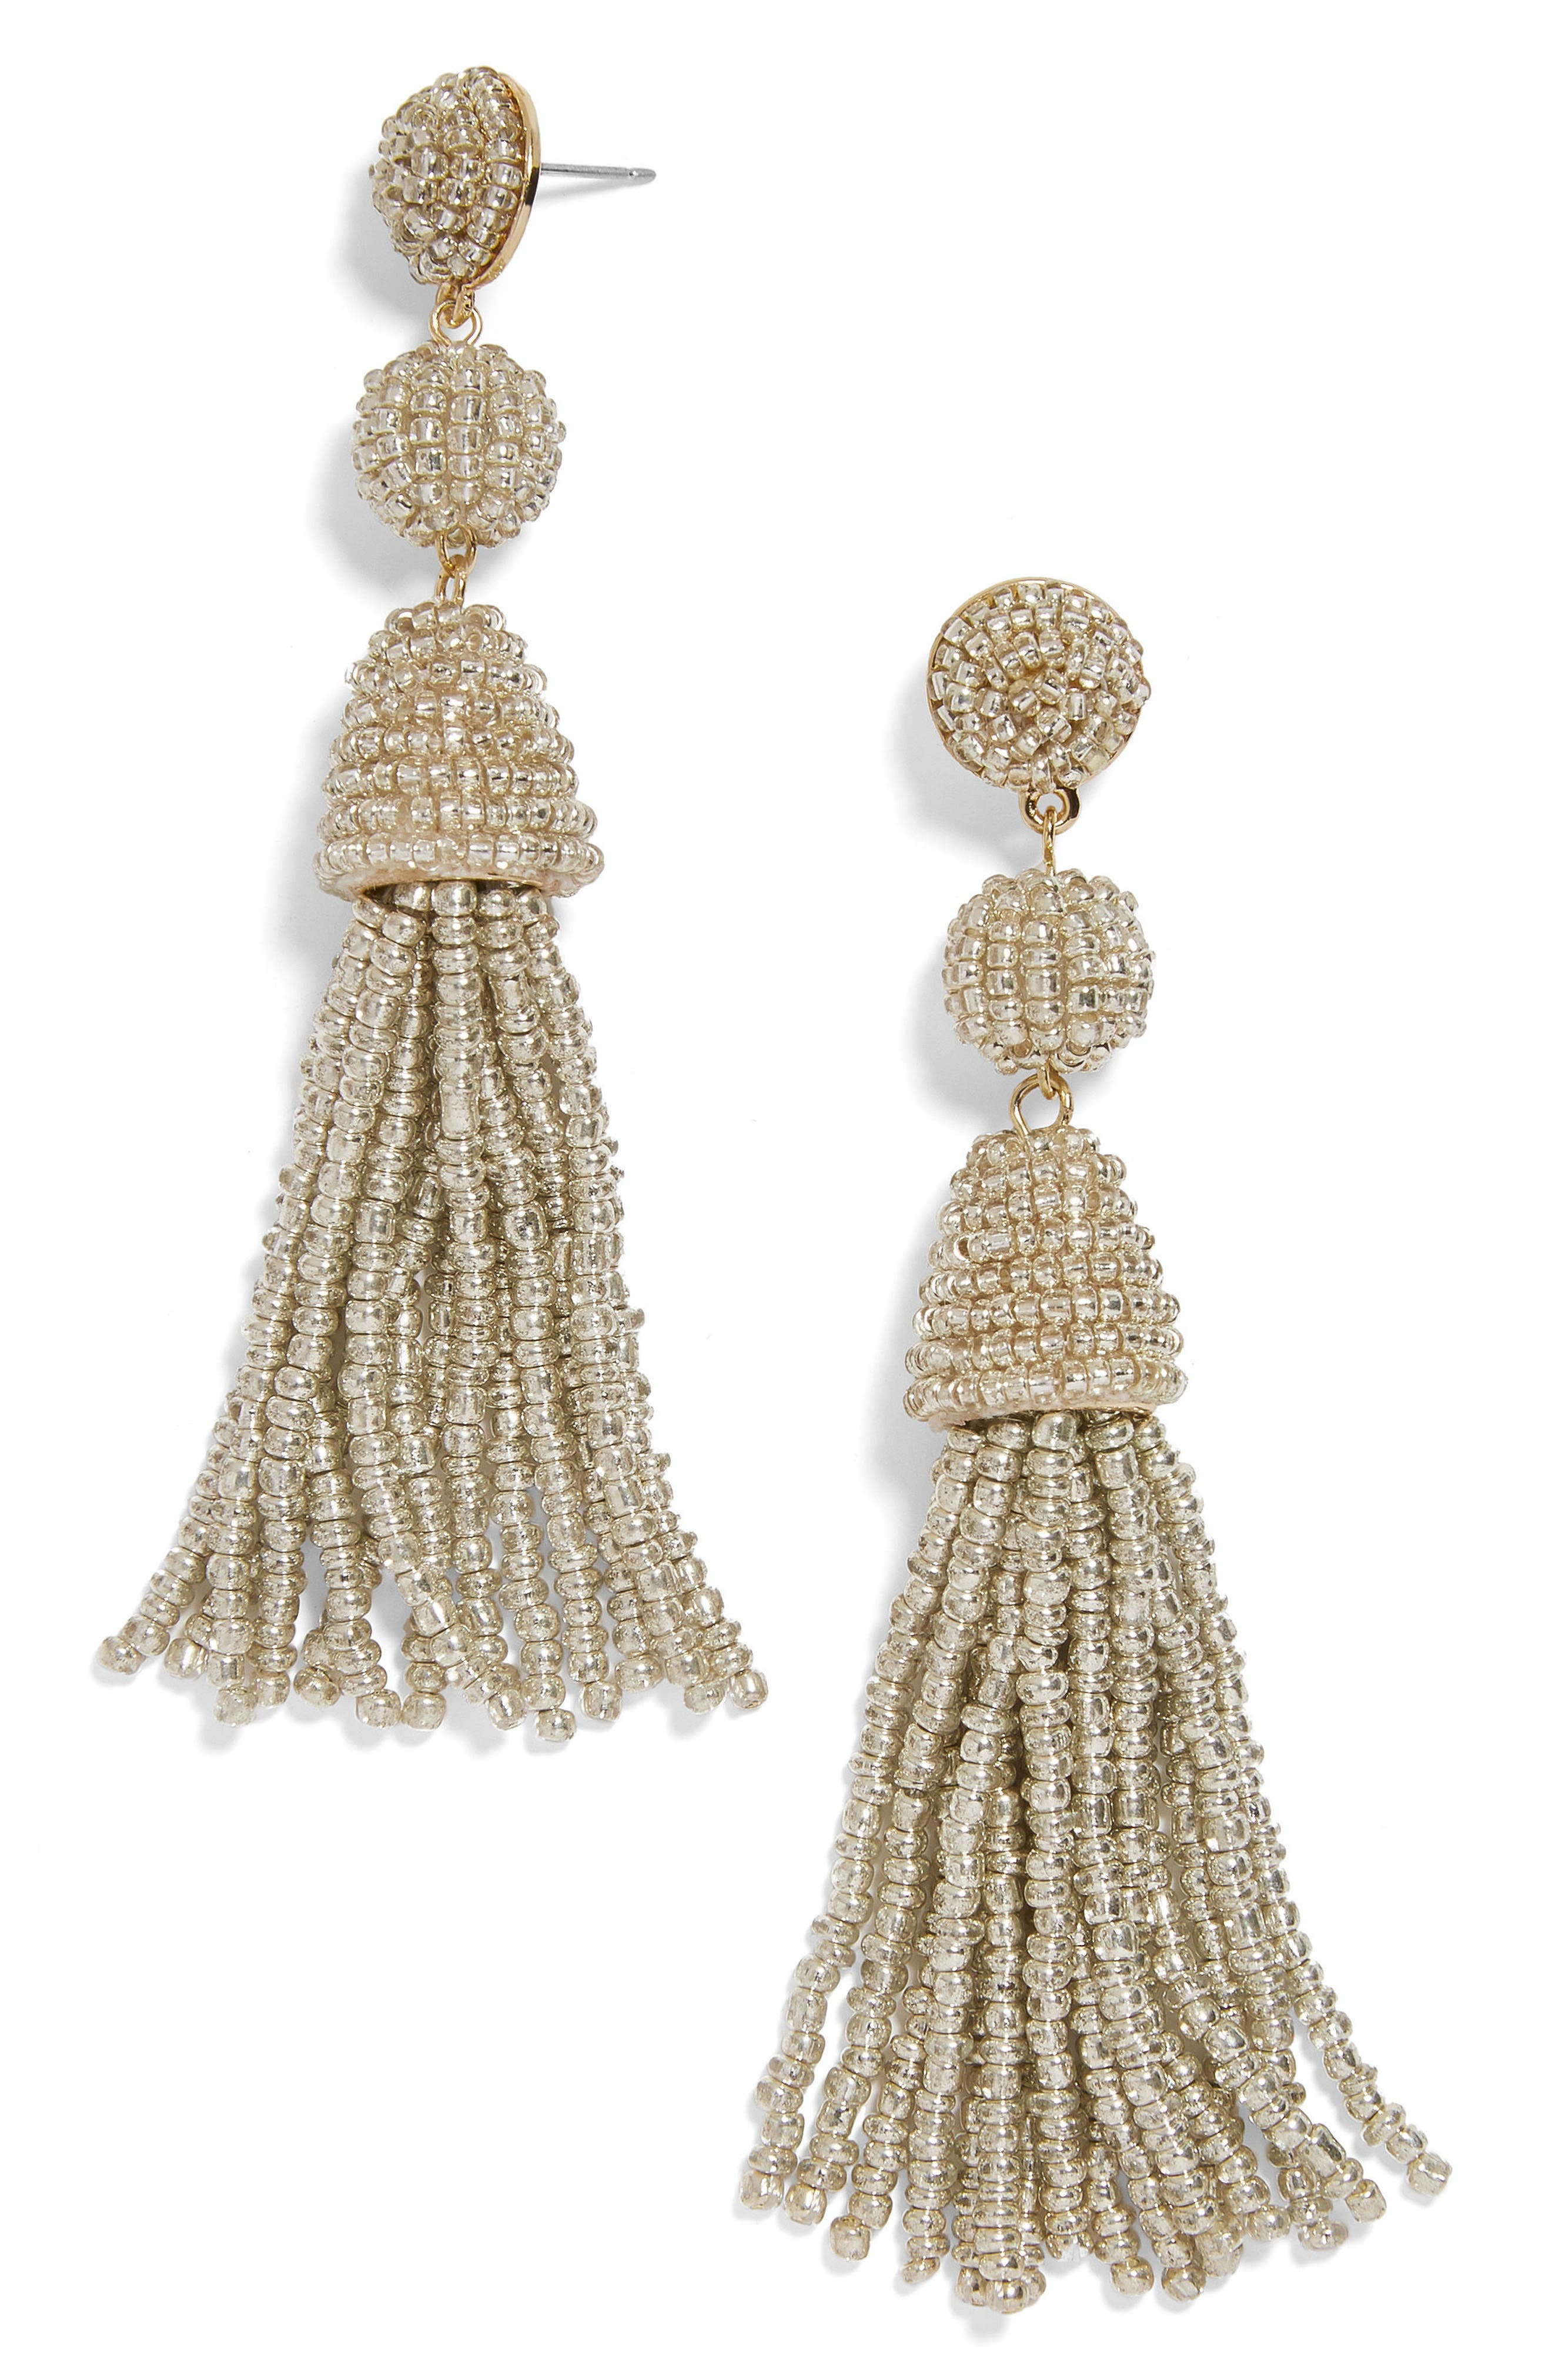 Granita Beaded Tassel Earrings,                             Main thumbnail 1, color,                             SILVER